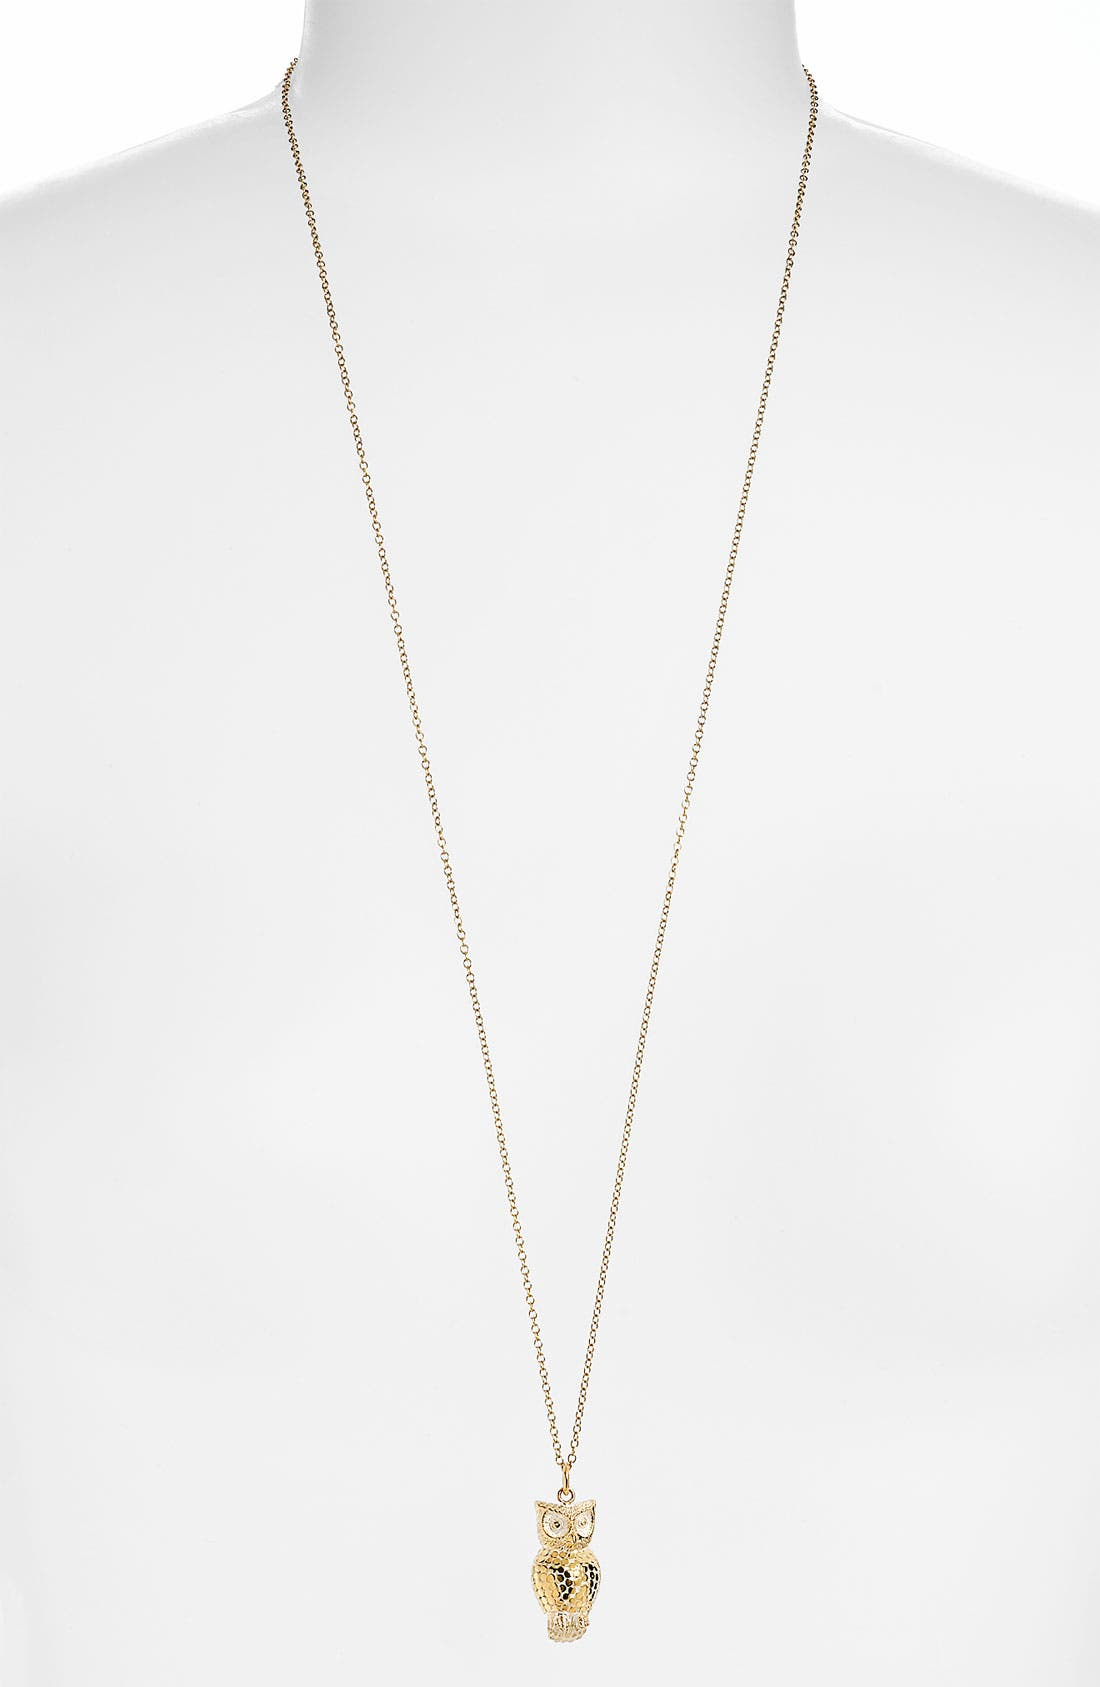 Main Image - Anna Beck 'Animals' Long Owl Pendant Necklace